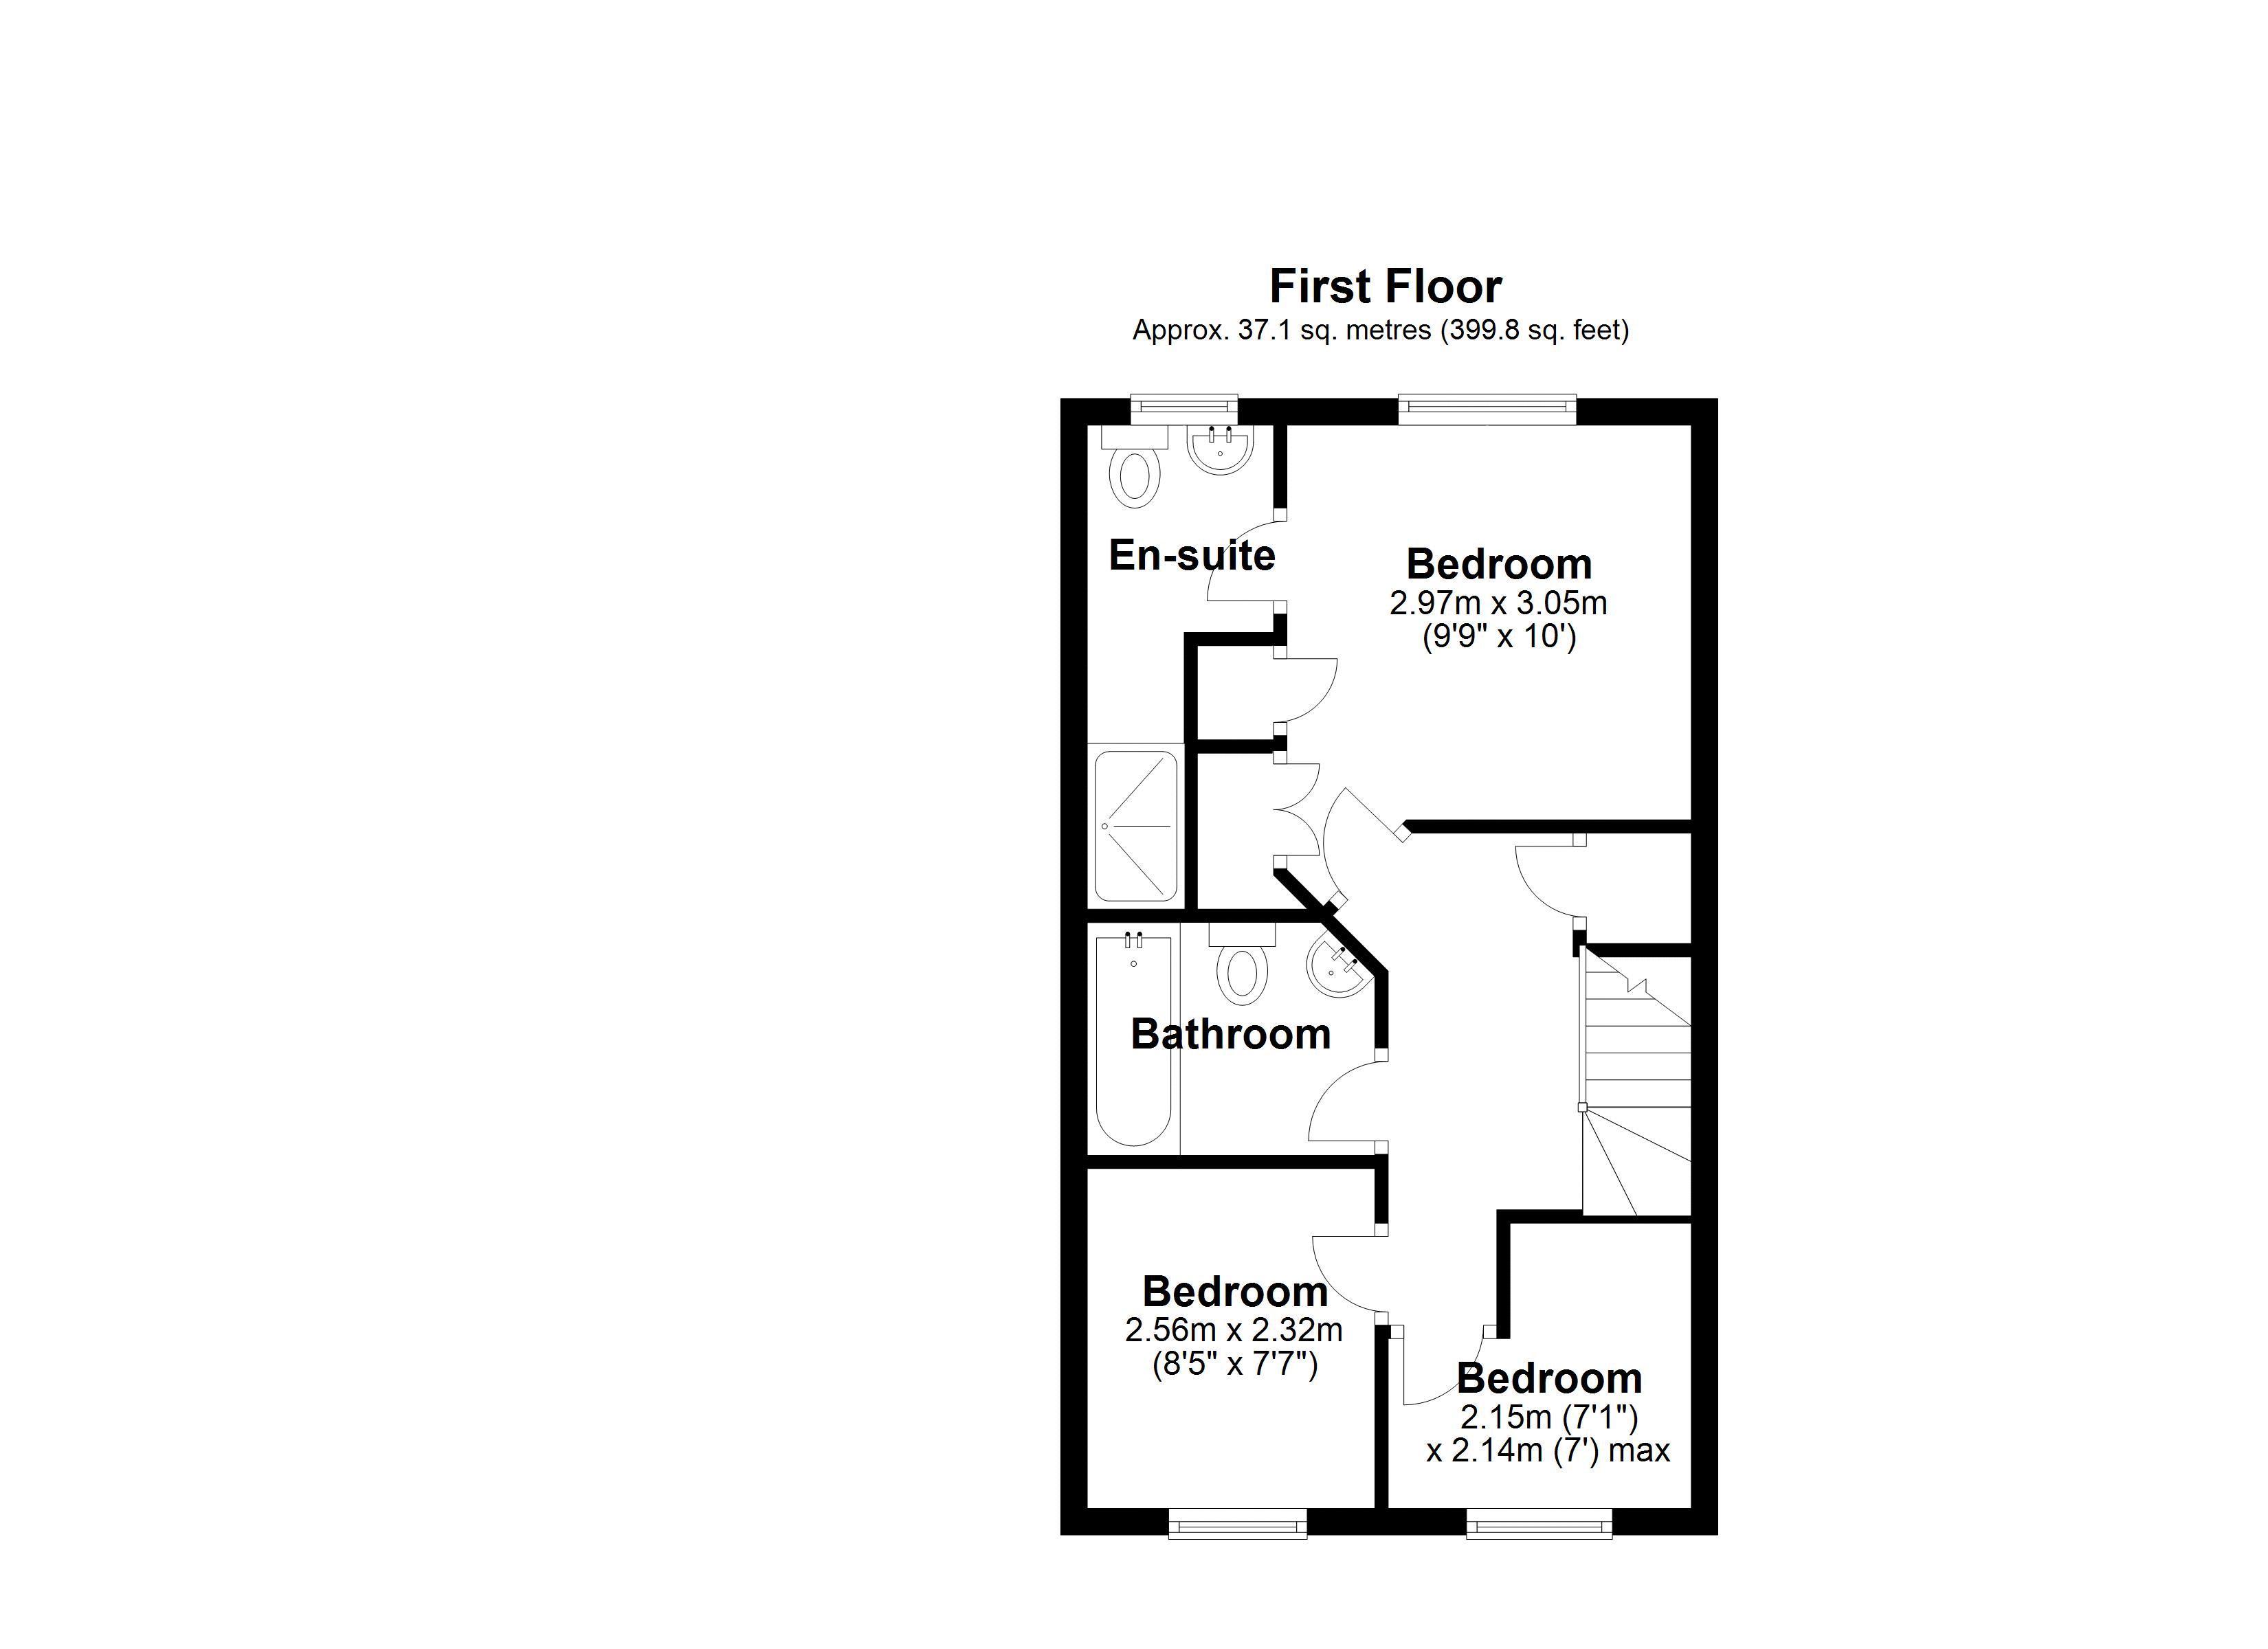 Newdale Holt first floor plan